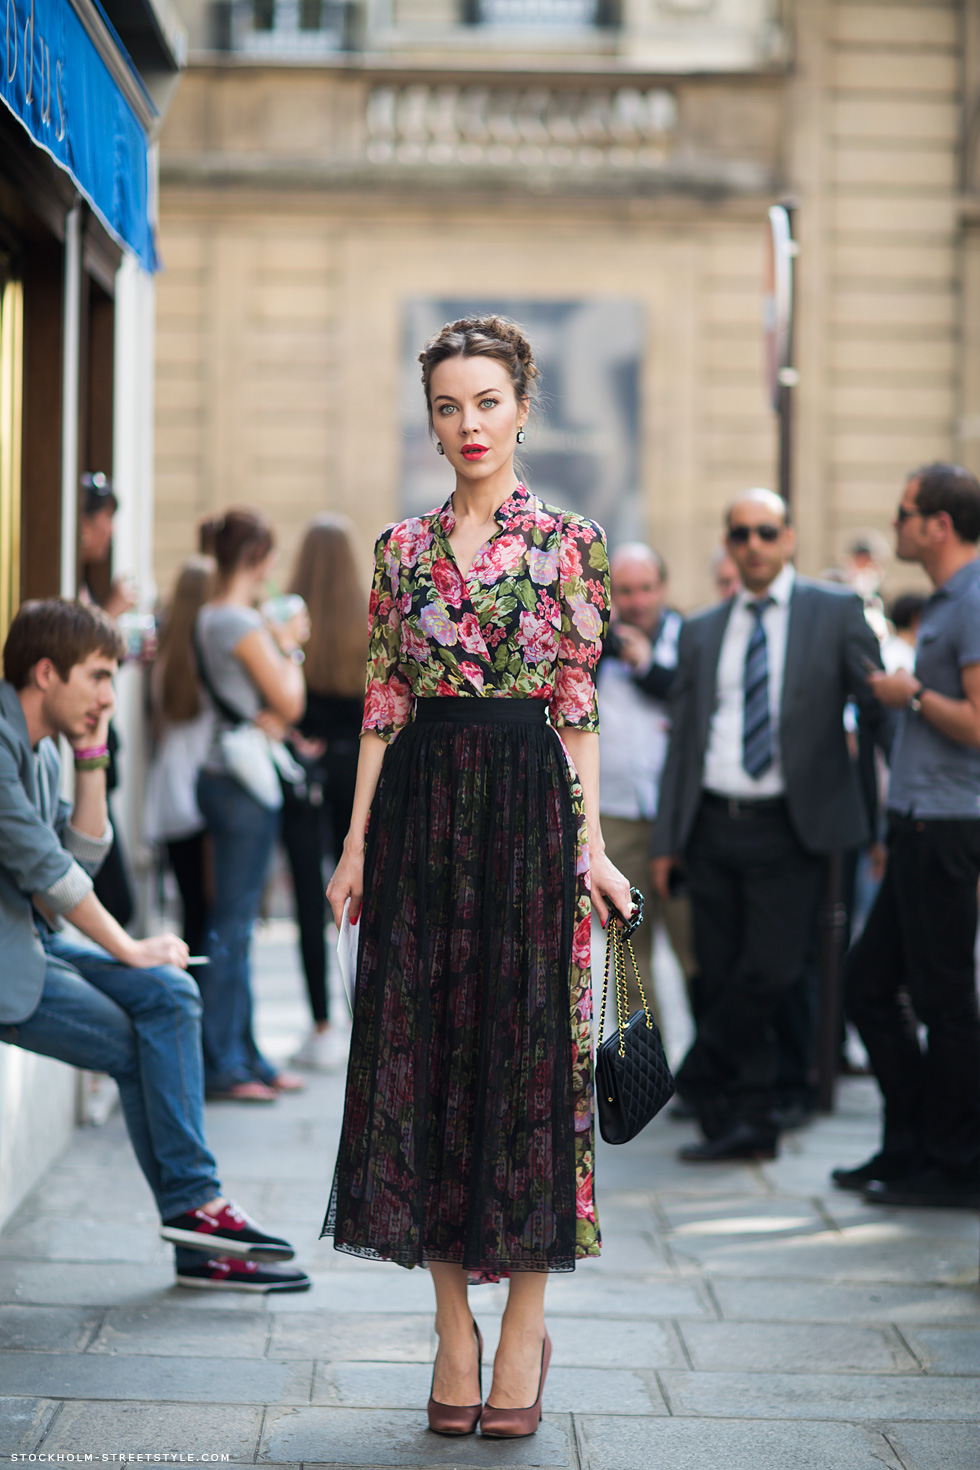 На фото: блузка с ярким цветочным узором.